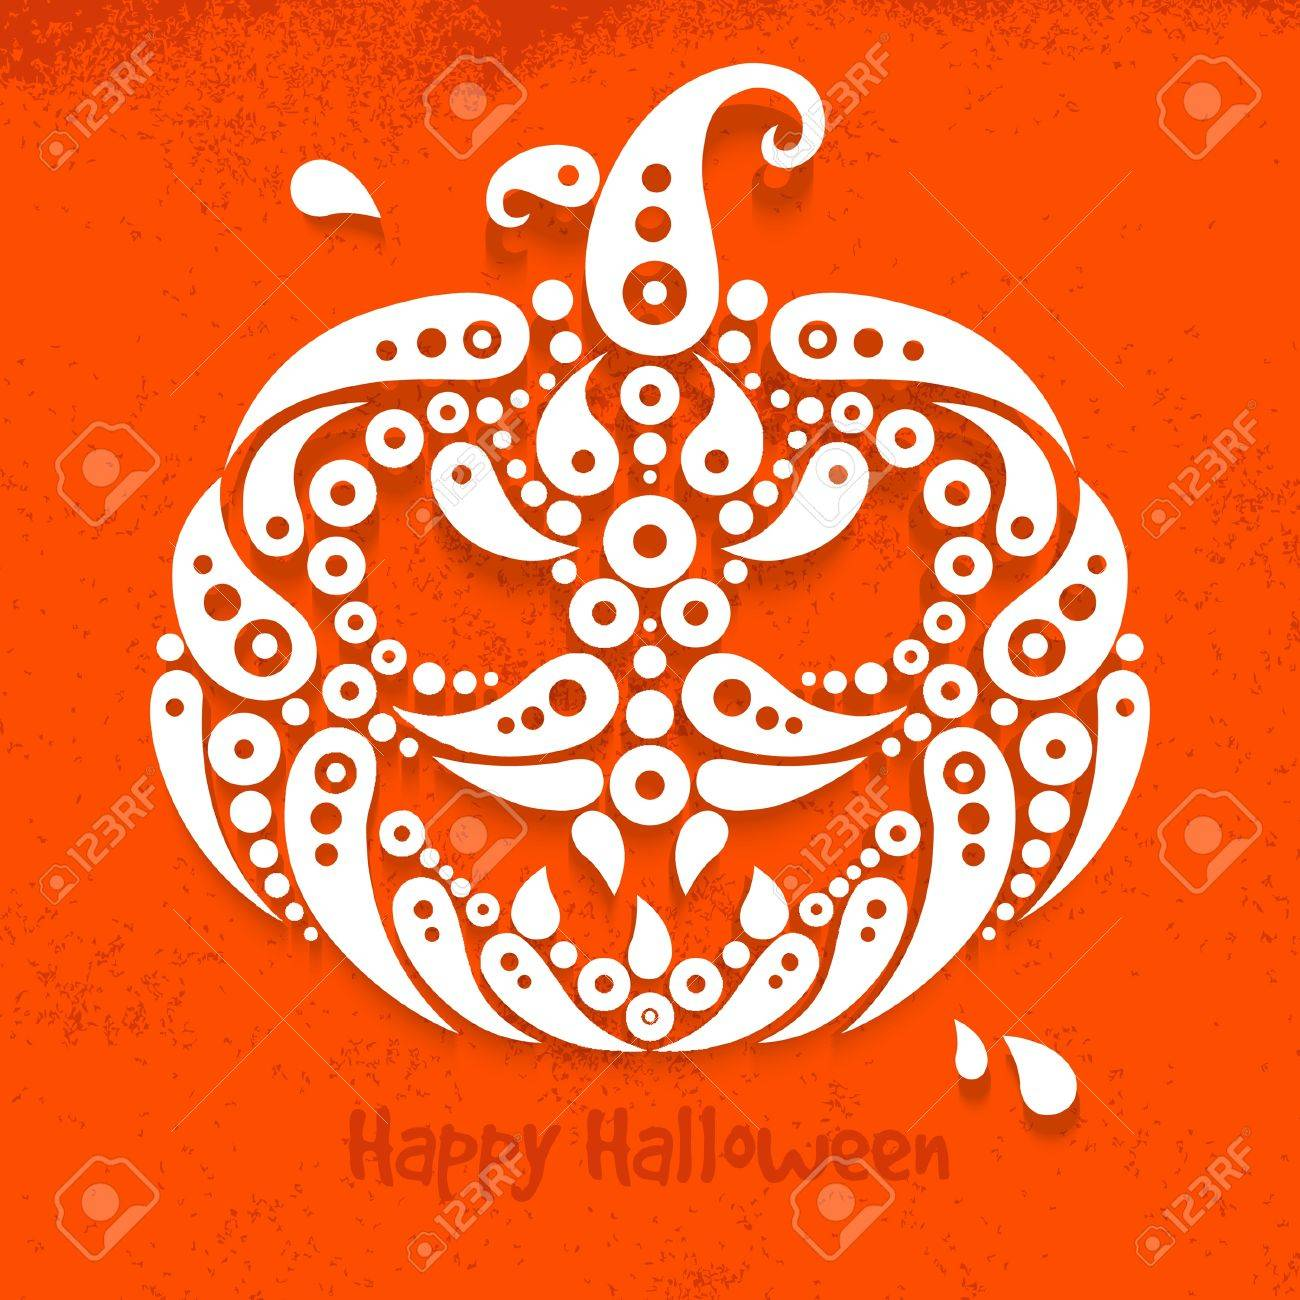 Halloween pumpkin. Decorative pattern silhouette of pumpkin Stock Vector - 21709726